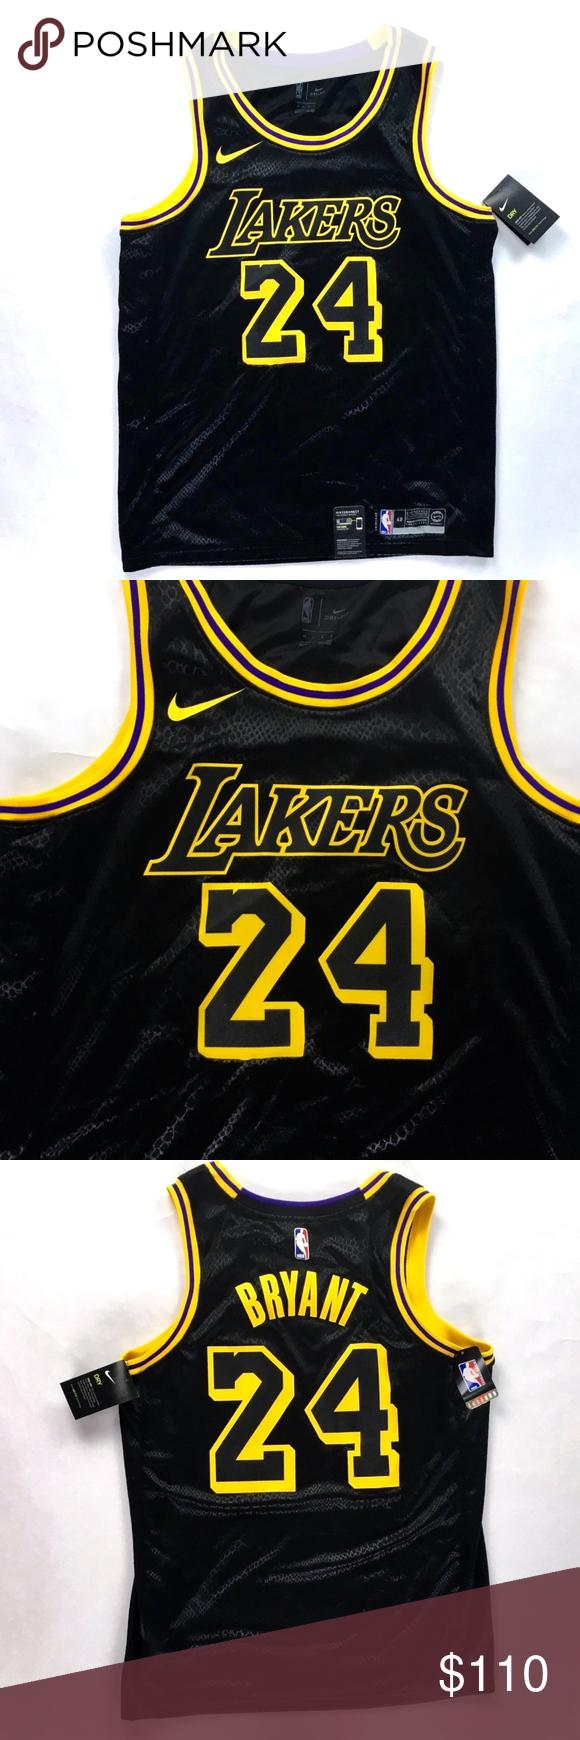 Nike LA Lakers Kobe Bryant City Swingman Jersey Nike NBA LA Lakers Kobe  Bryant City Edition 08434269a